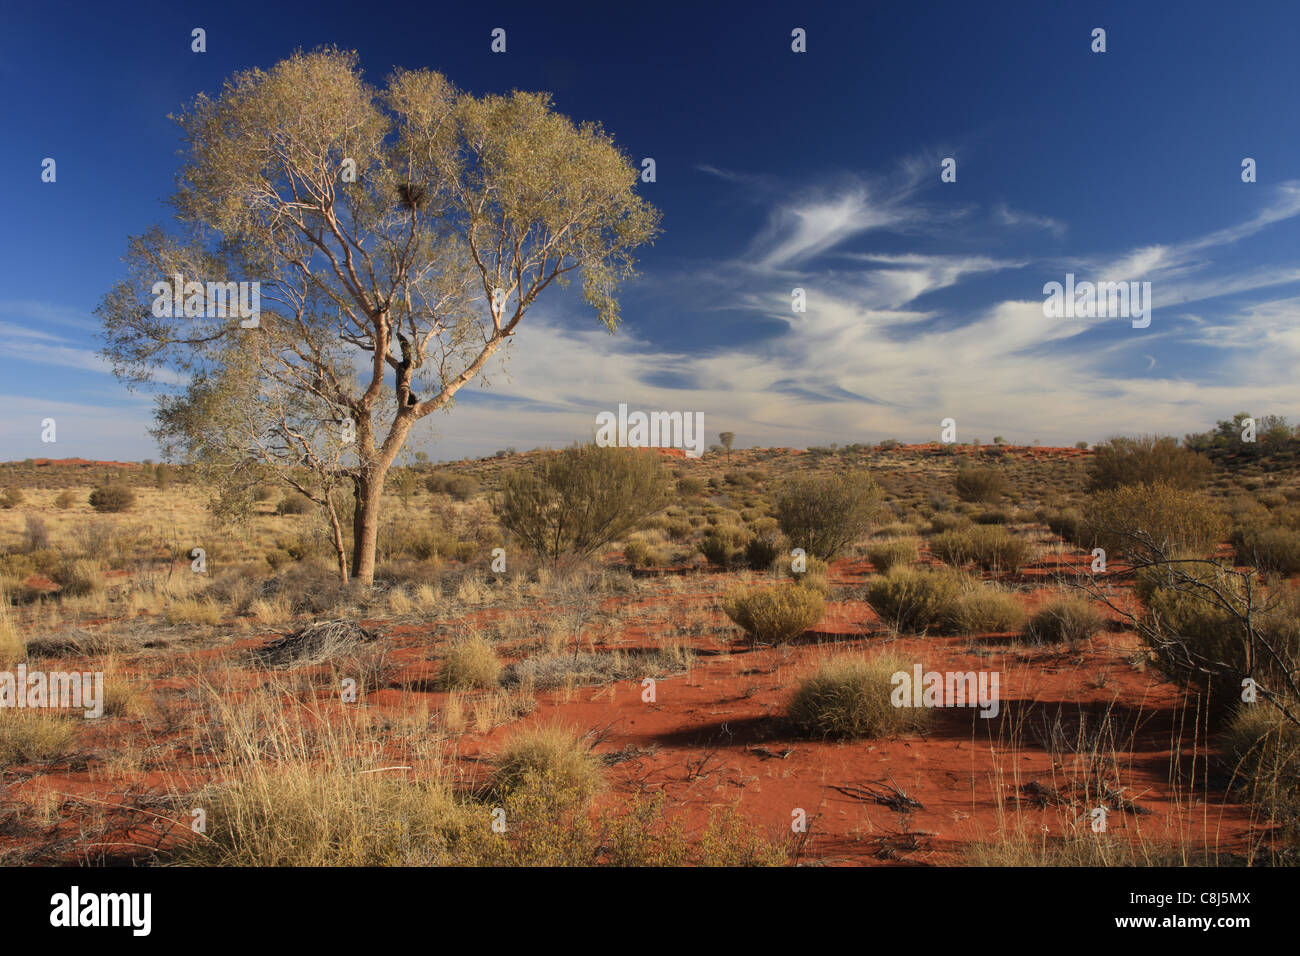 Outback, Australia, landscape, Aborigines, Australian desert, down under, Northern Territory, Central australia, - Stock Image